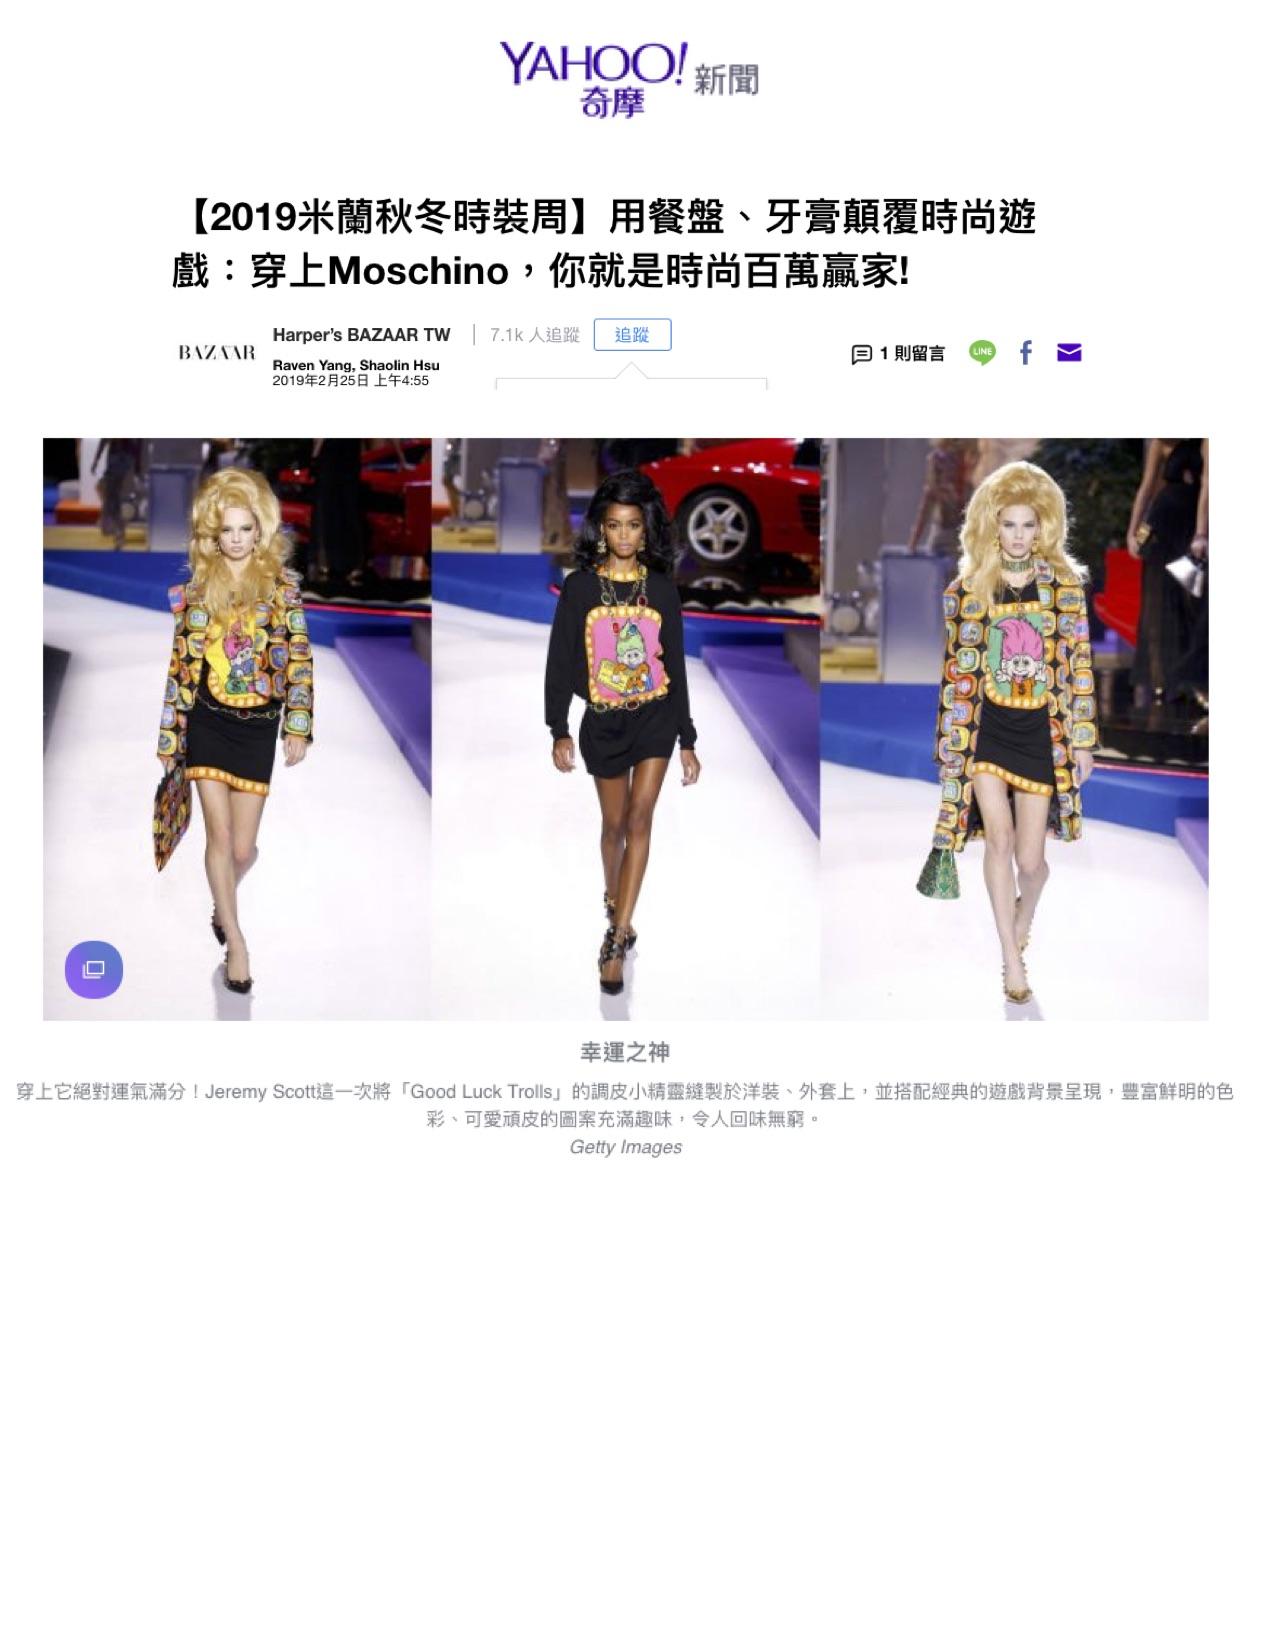 Yahoo News Taiwan - Good Luck Trolls x Moschino.jpg